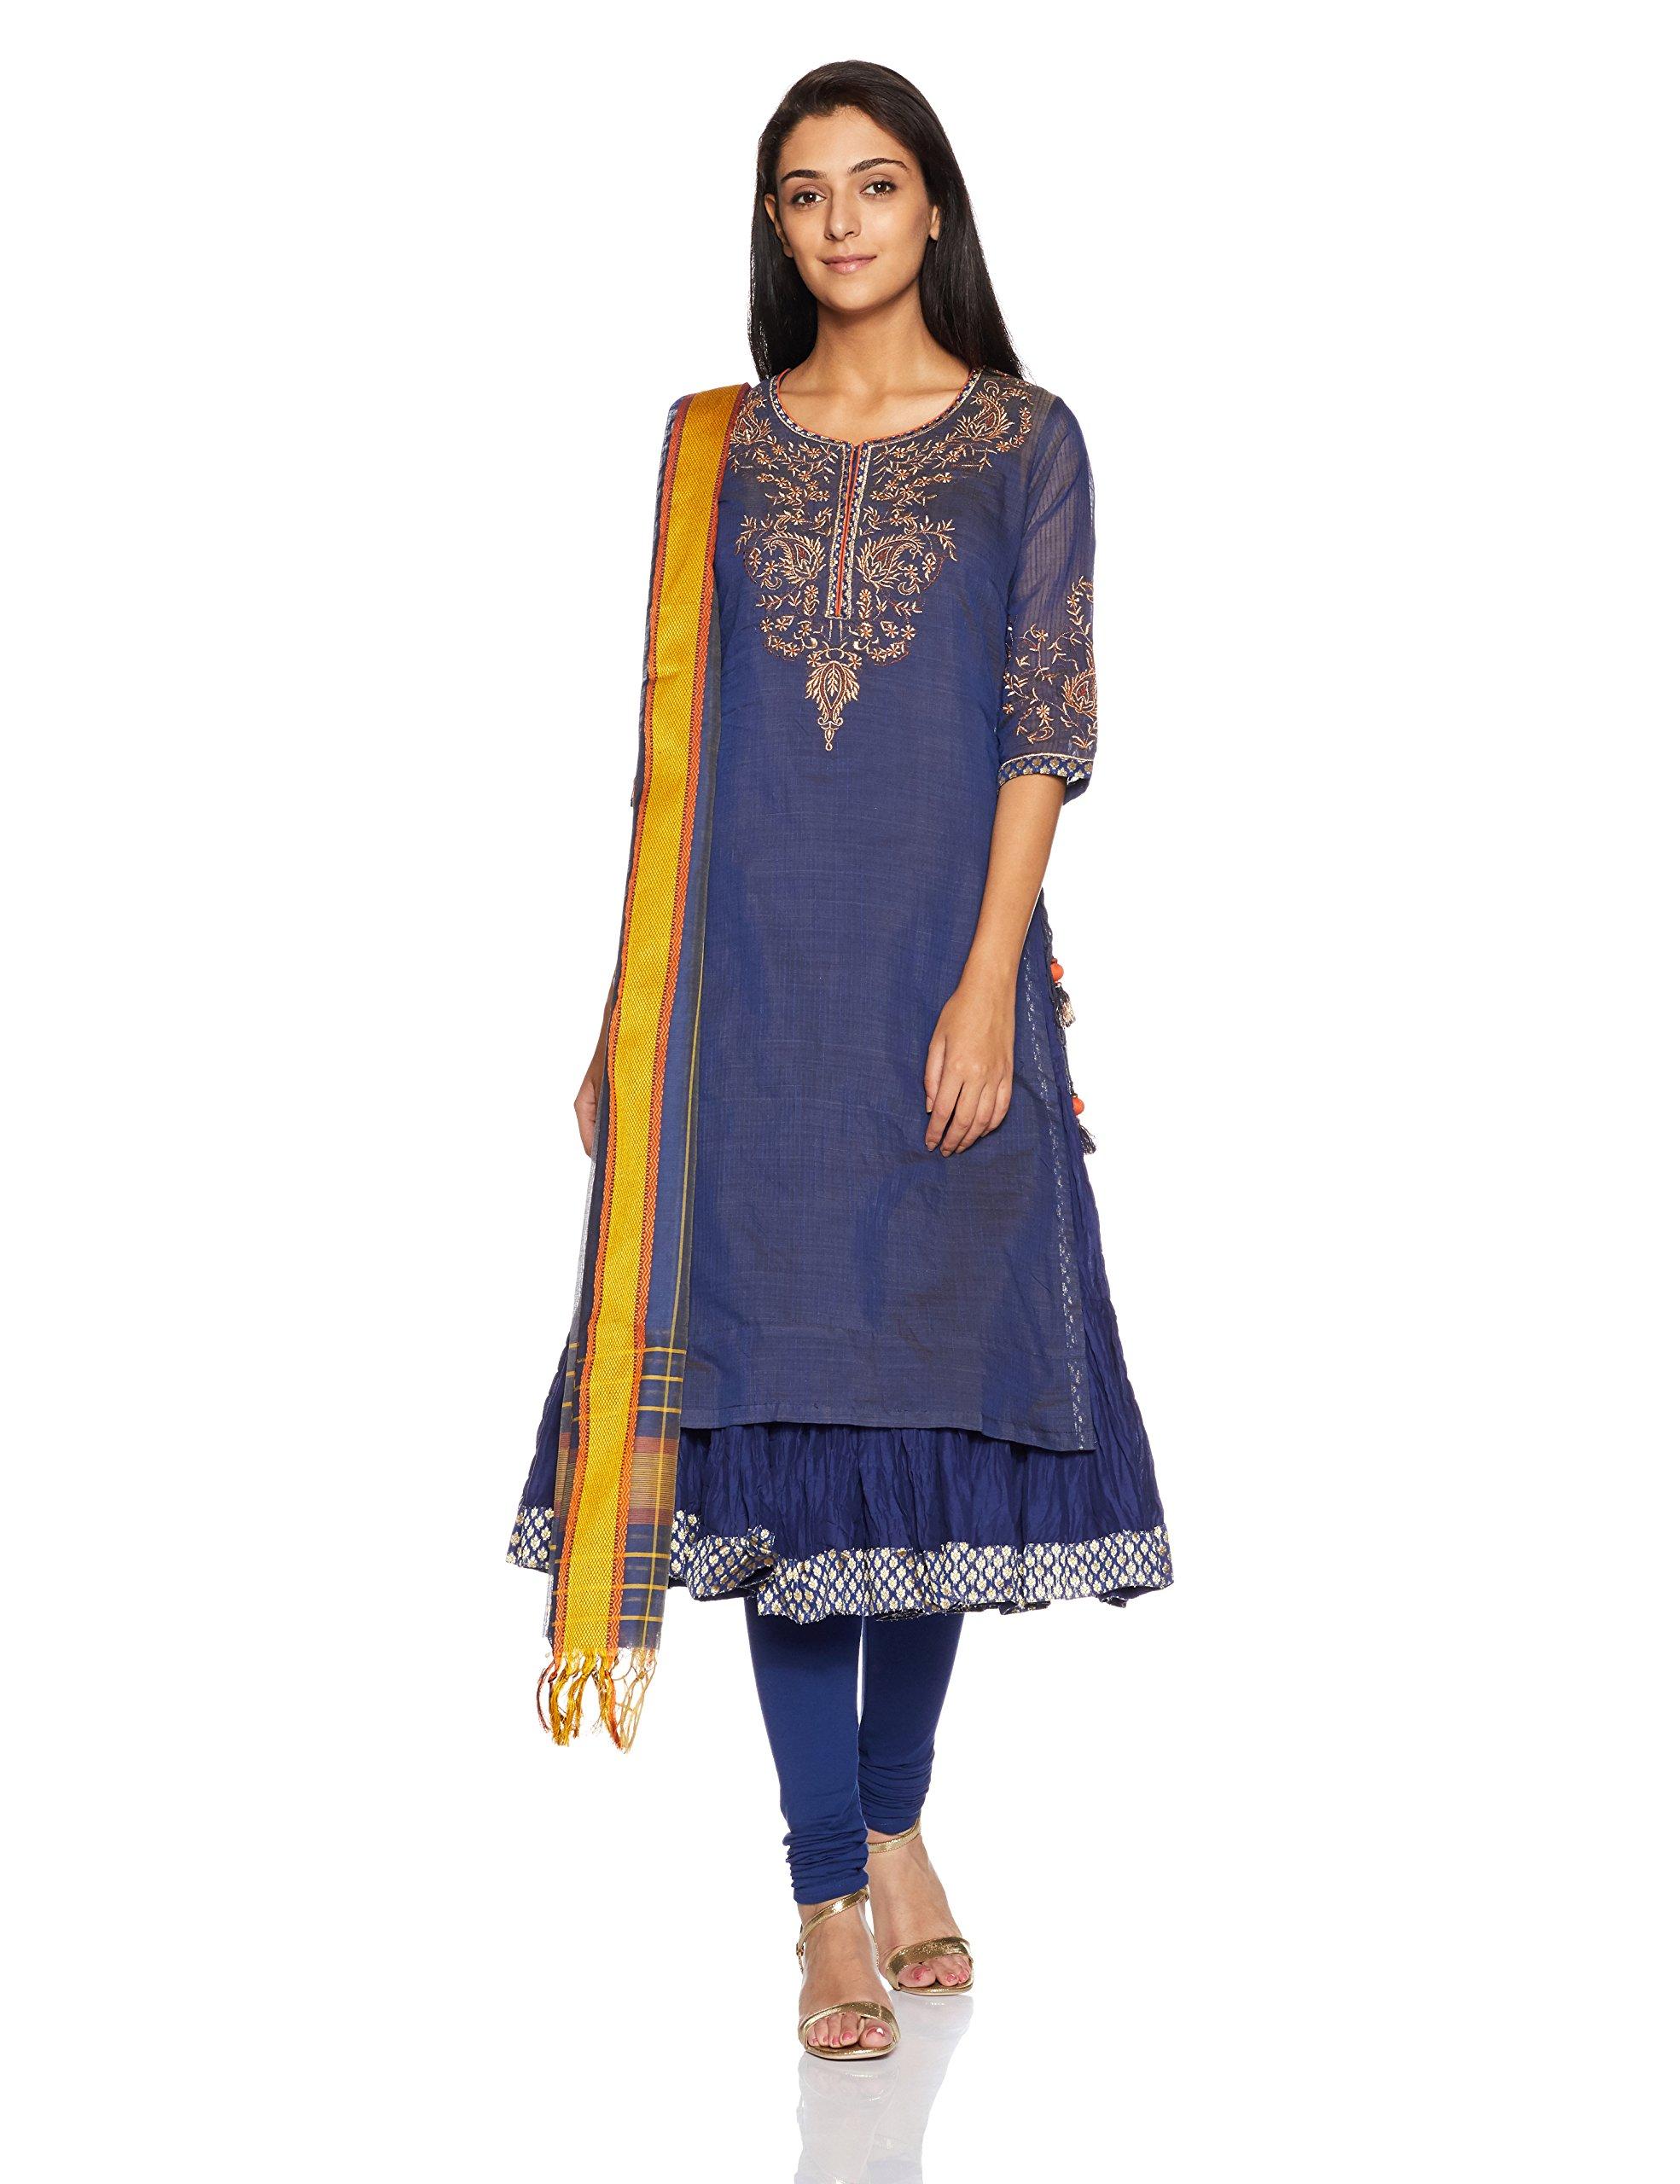 BIBA Women's Straight Poly Cotton & Viscose Suit Set 32 Navy Blue